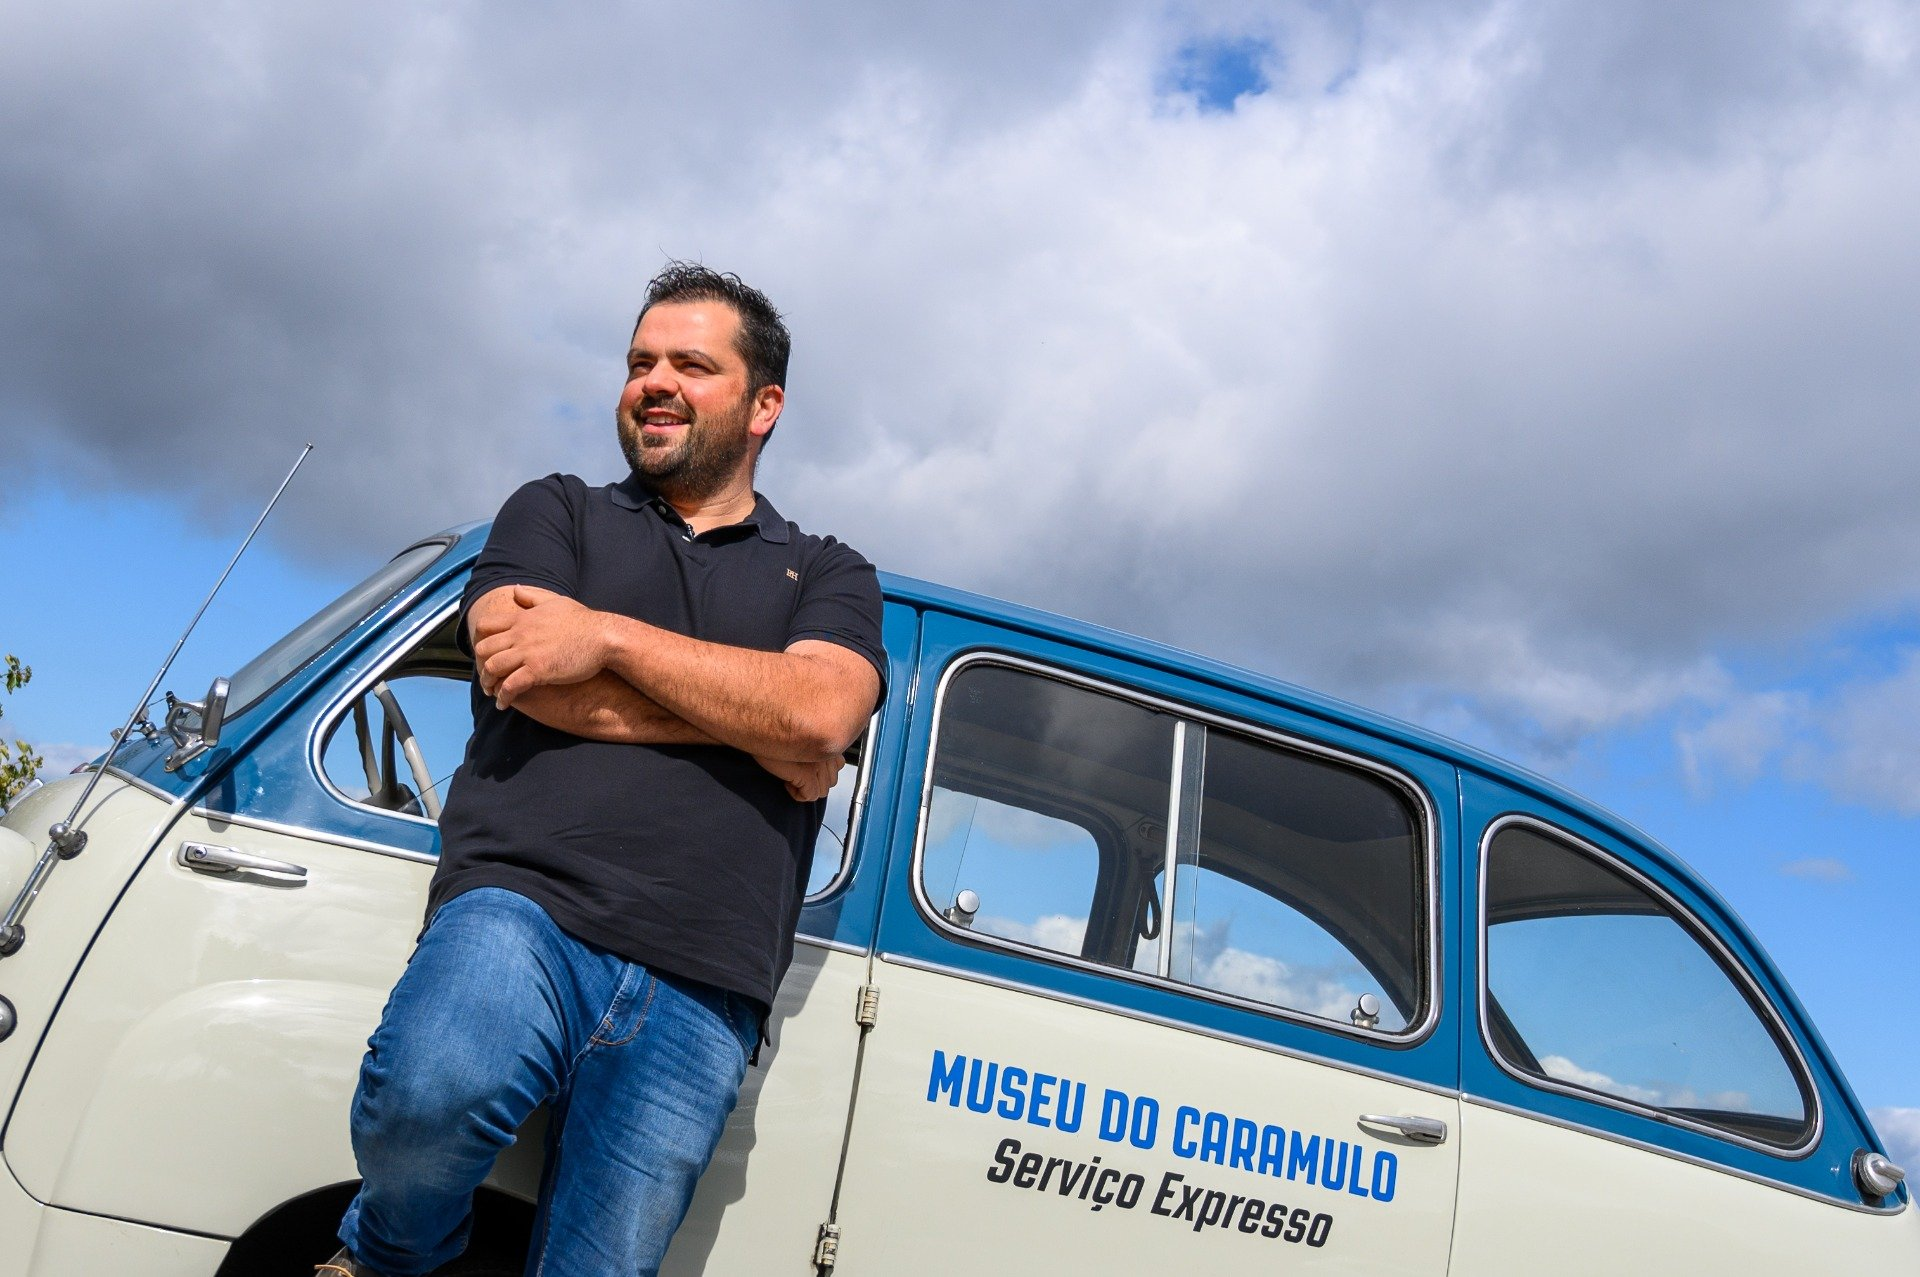 Diogo Rocha e Museu Caramulo